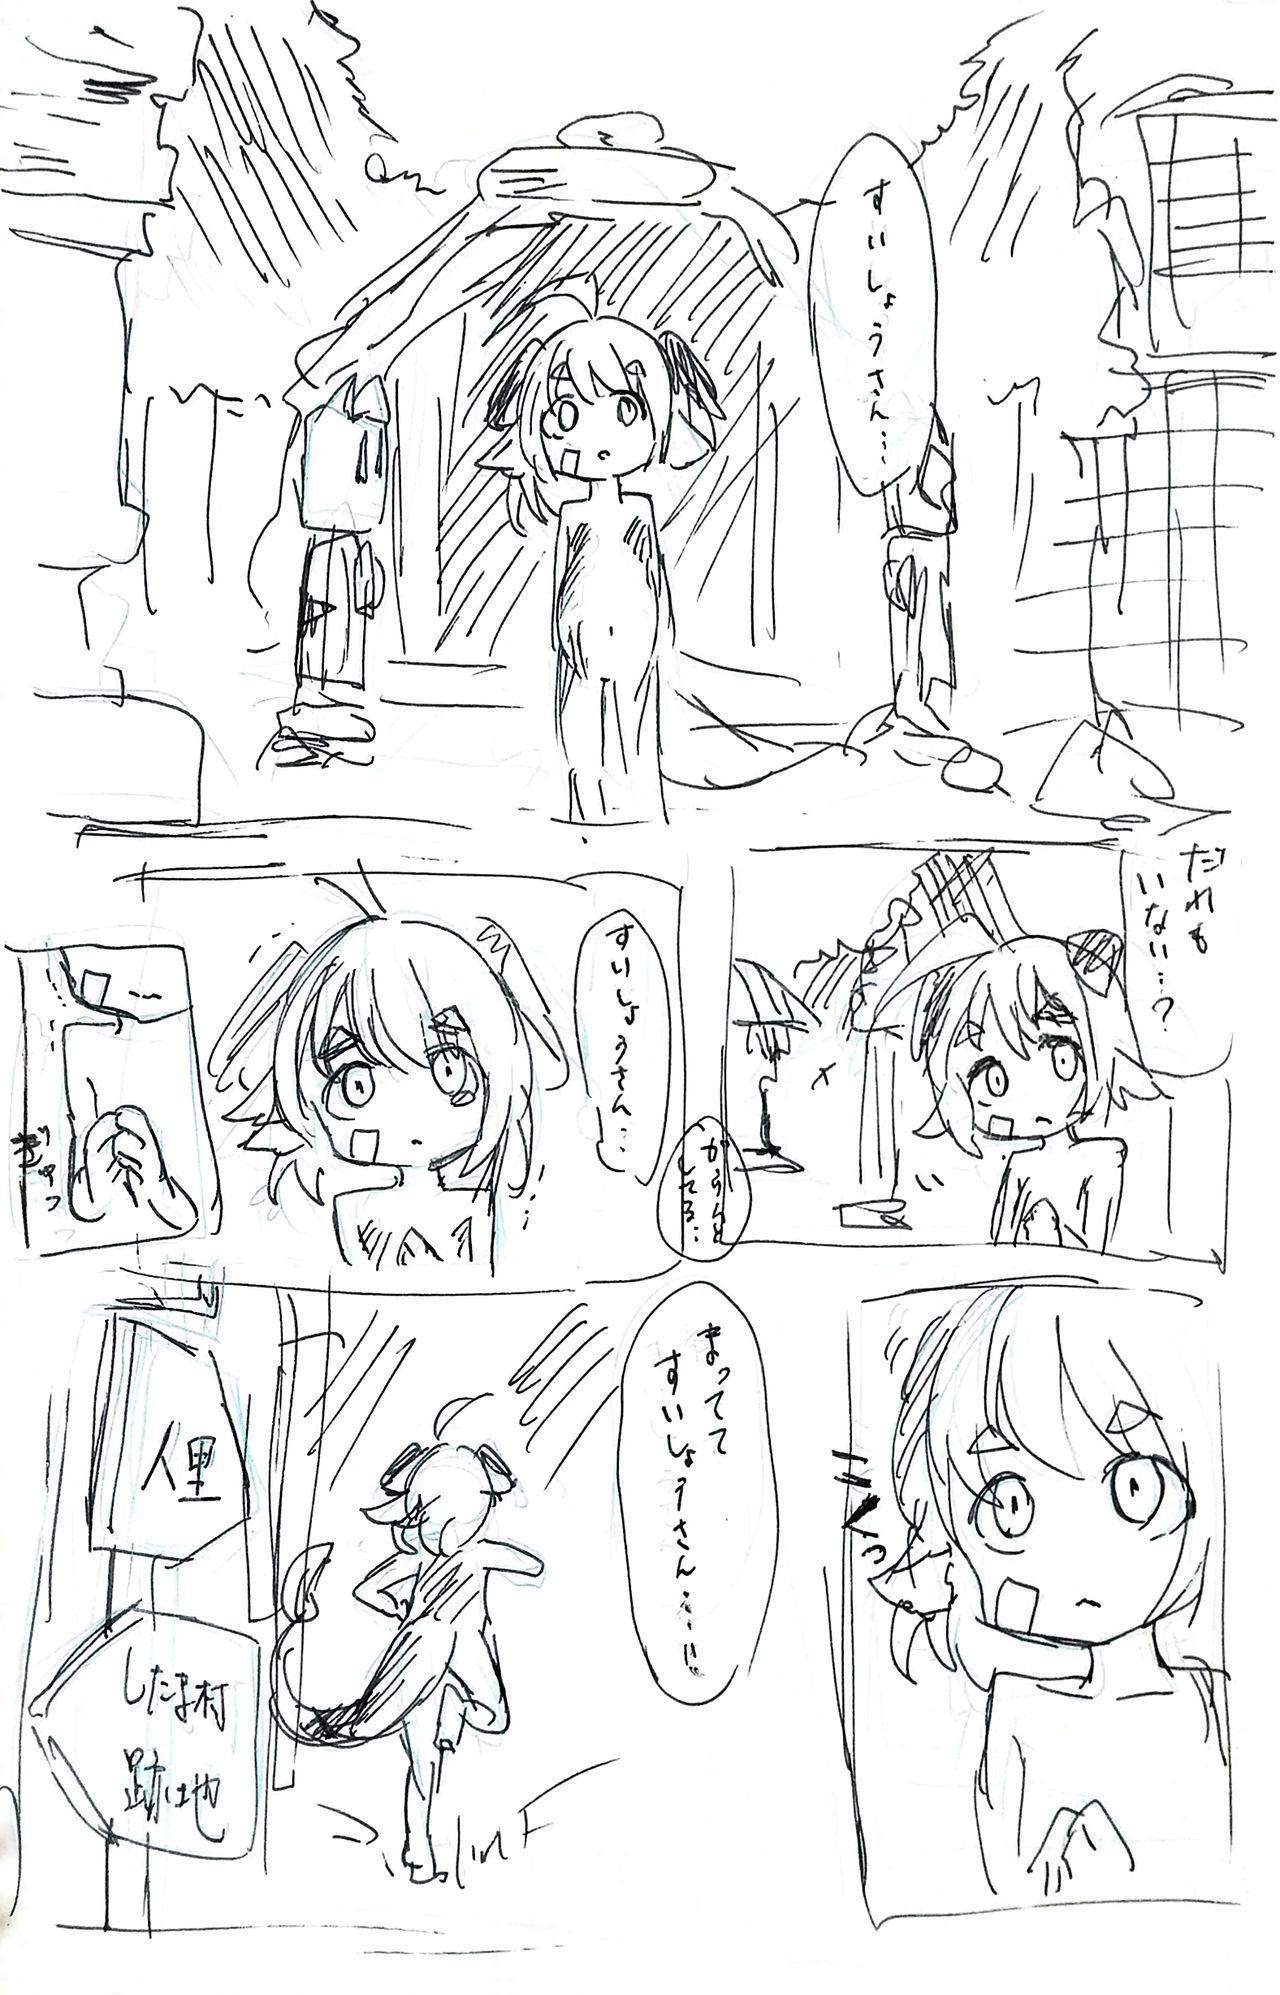 Hisui-chan carnival biyori 12